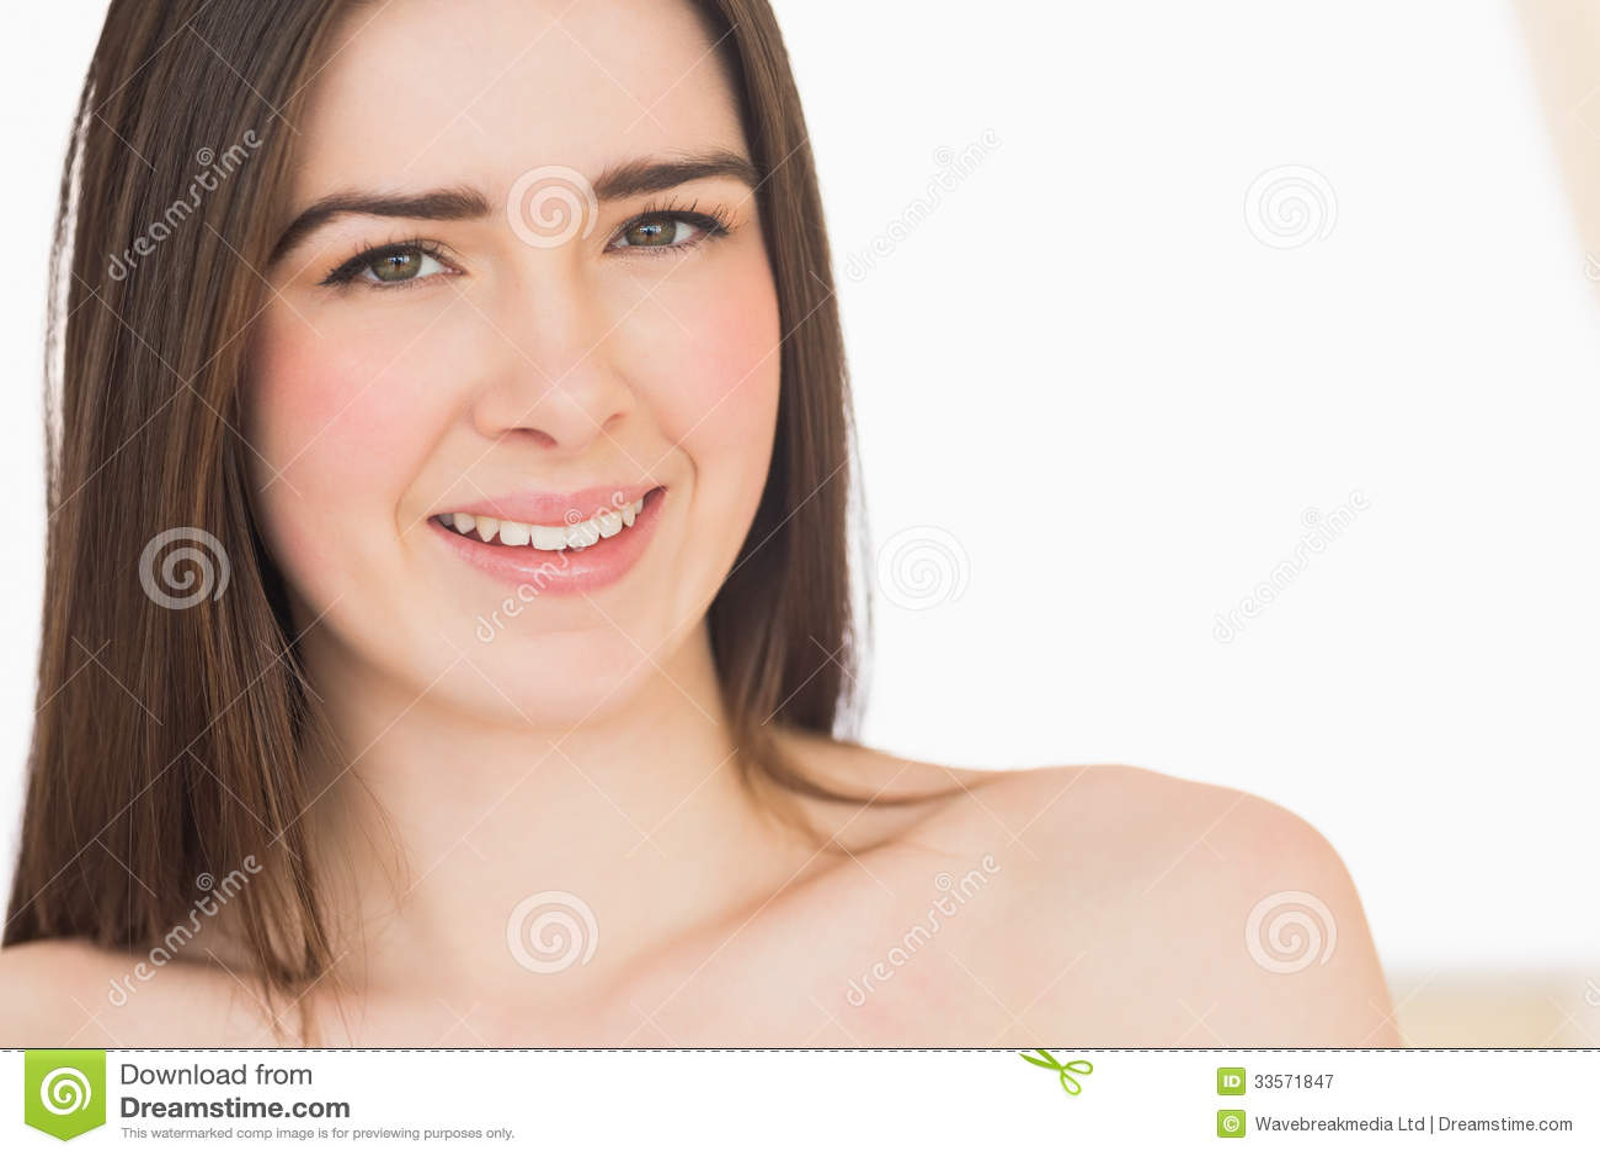 julie nudist